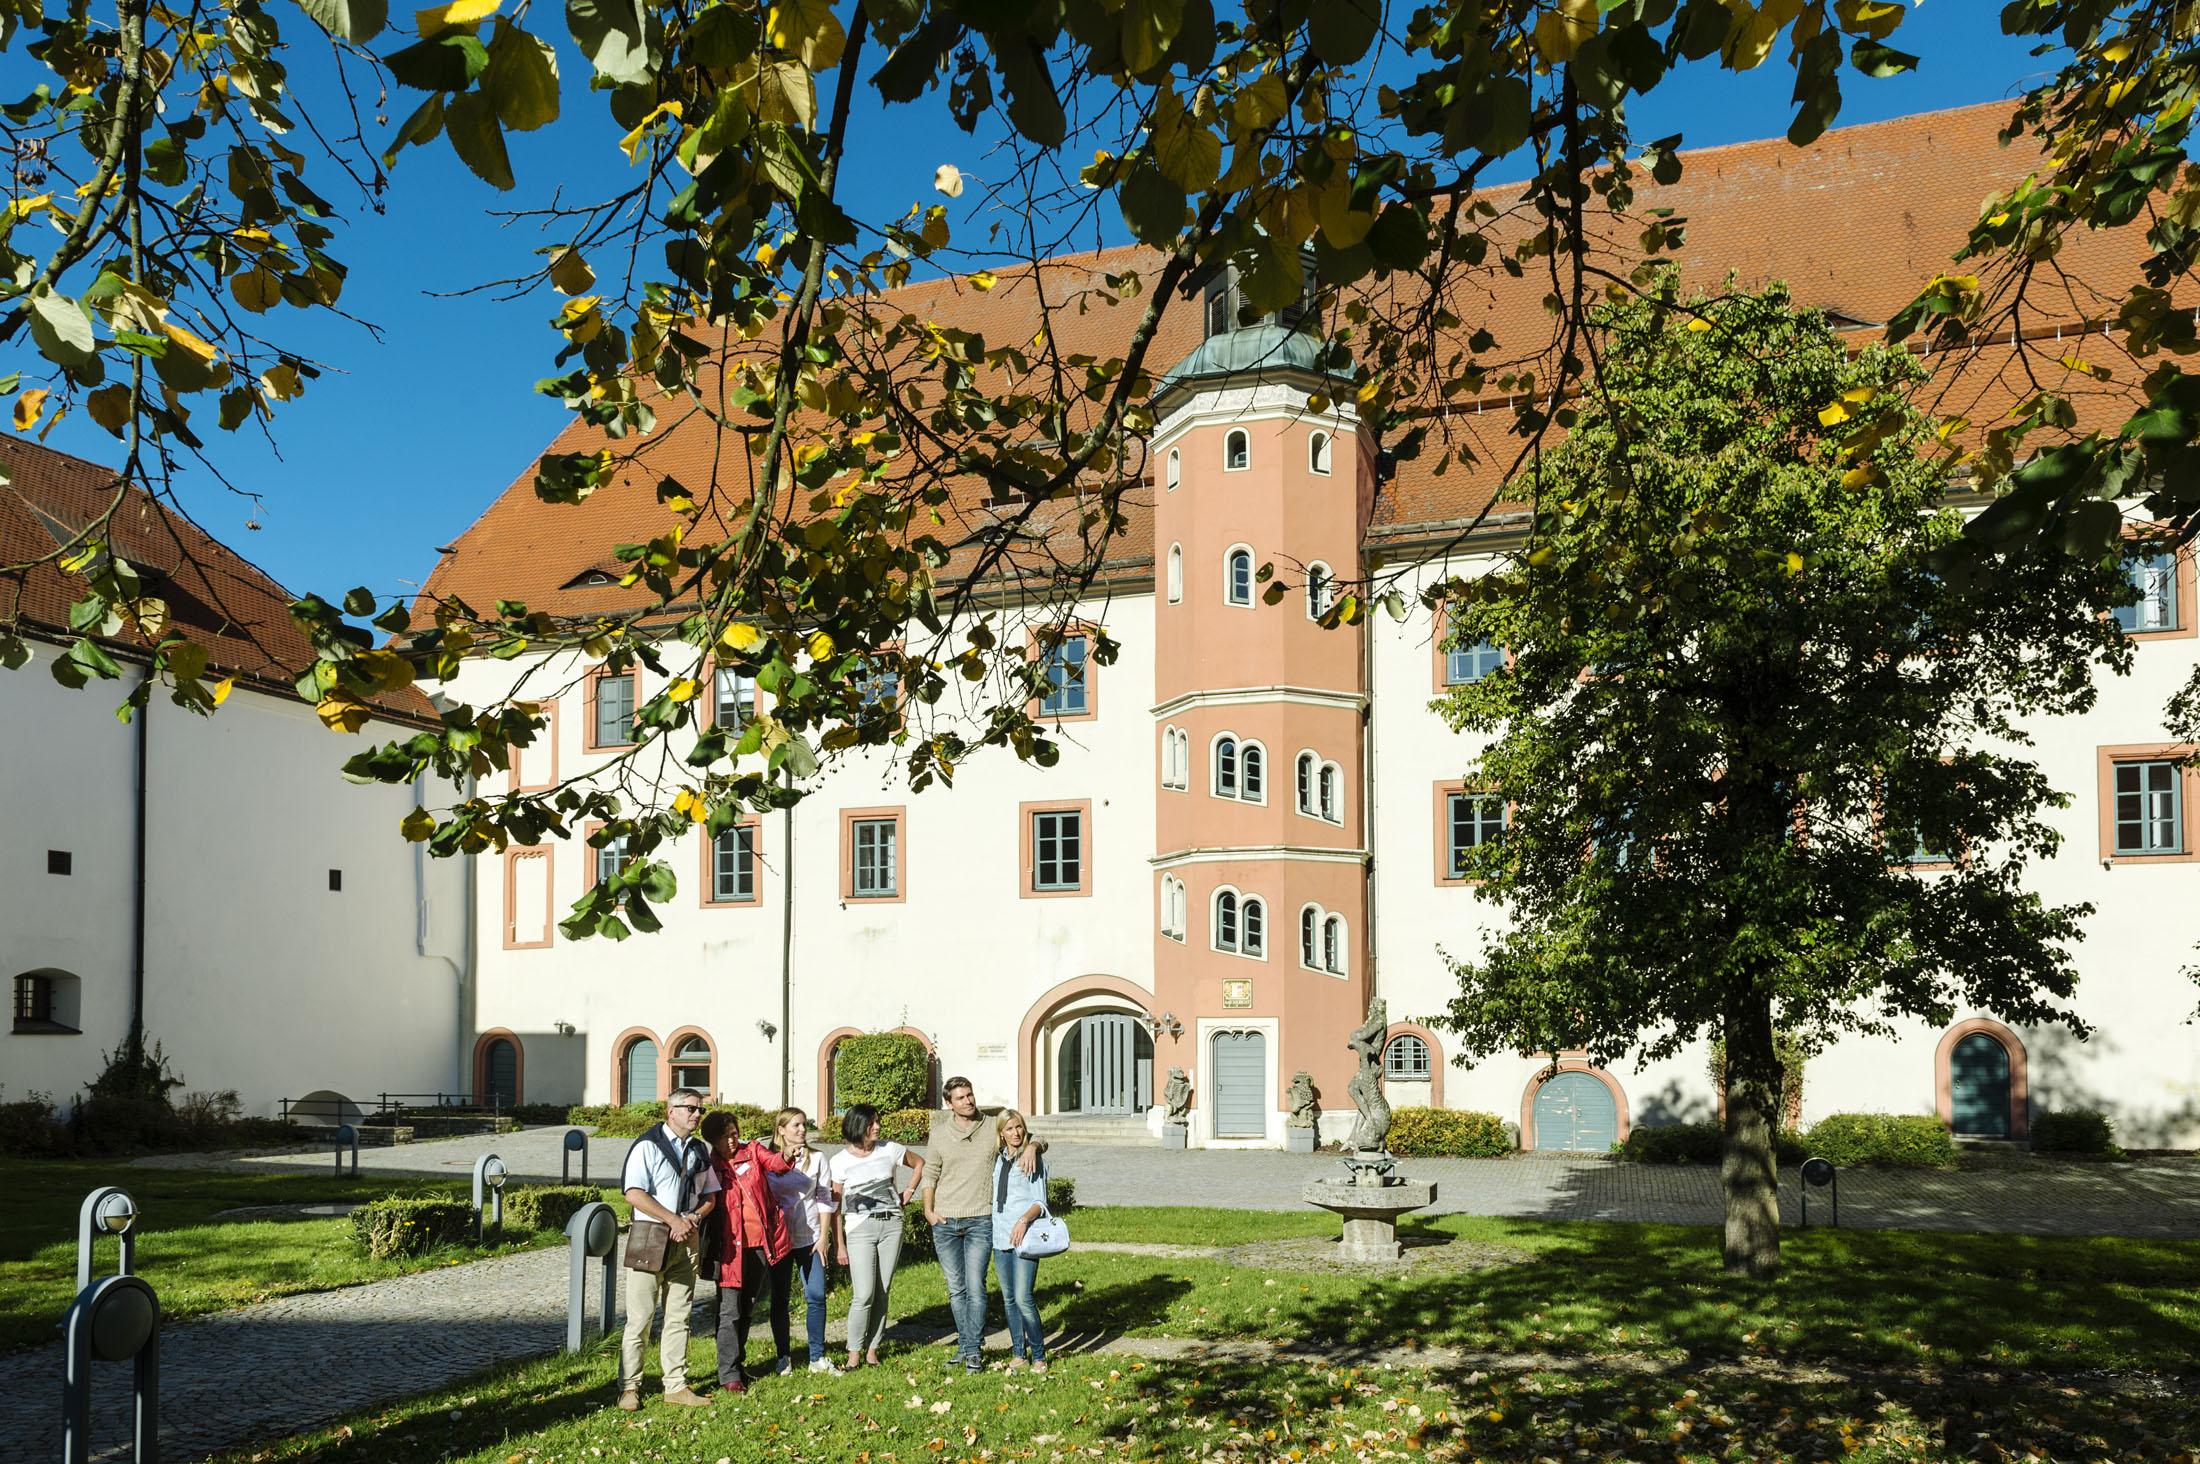 Castle of the Counts of the Palatinate - Neumarkter Residenz - ehem. Pfalzgrafenschloss